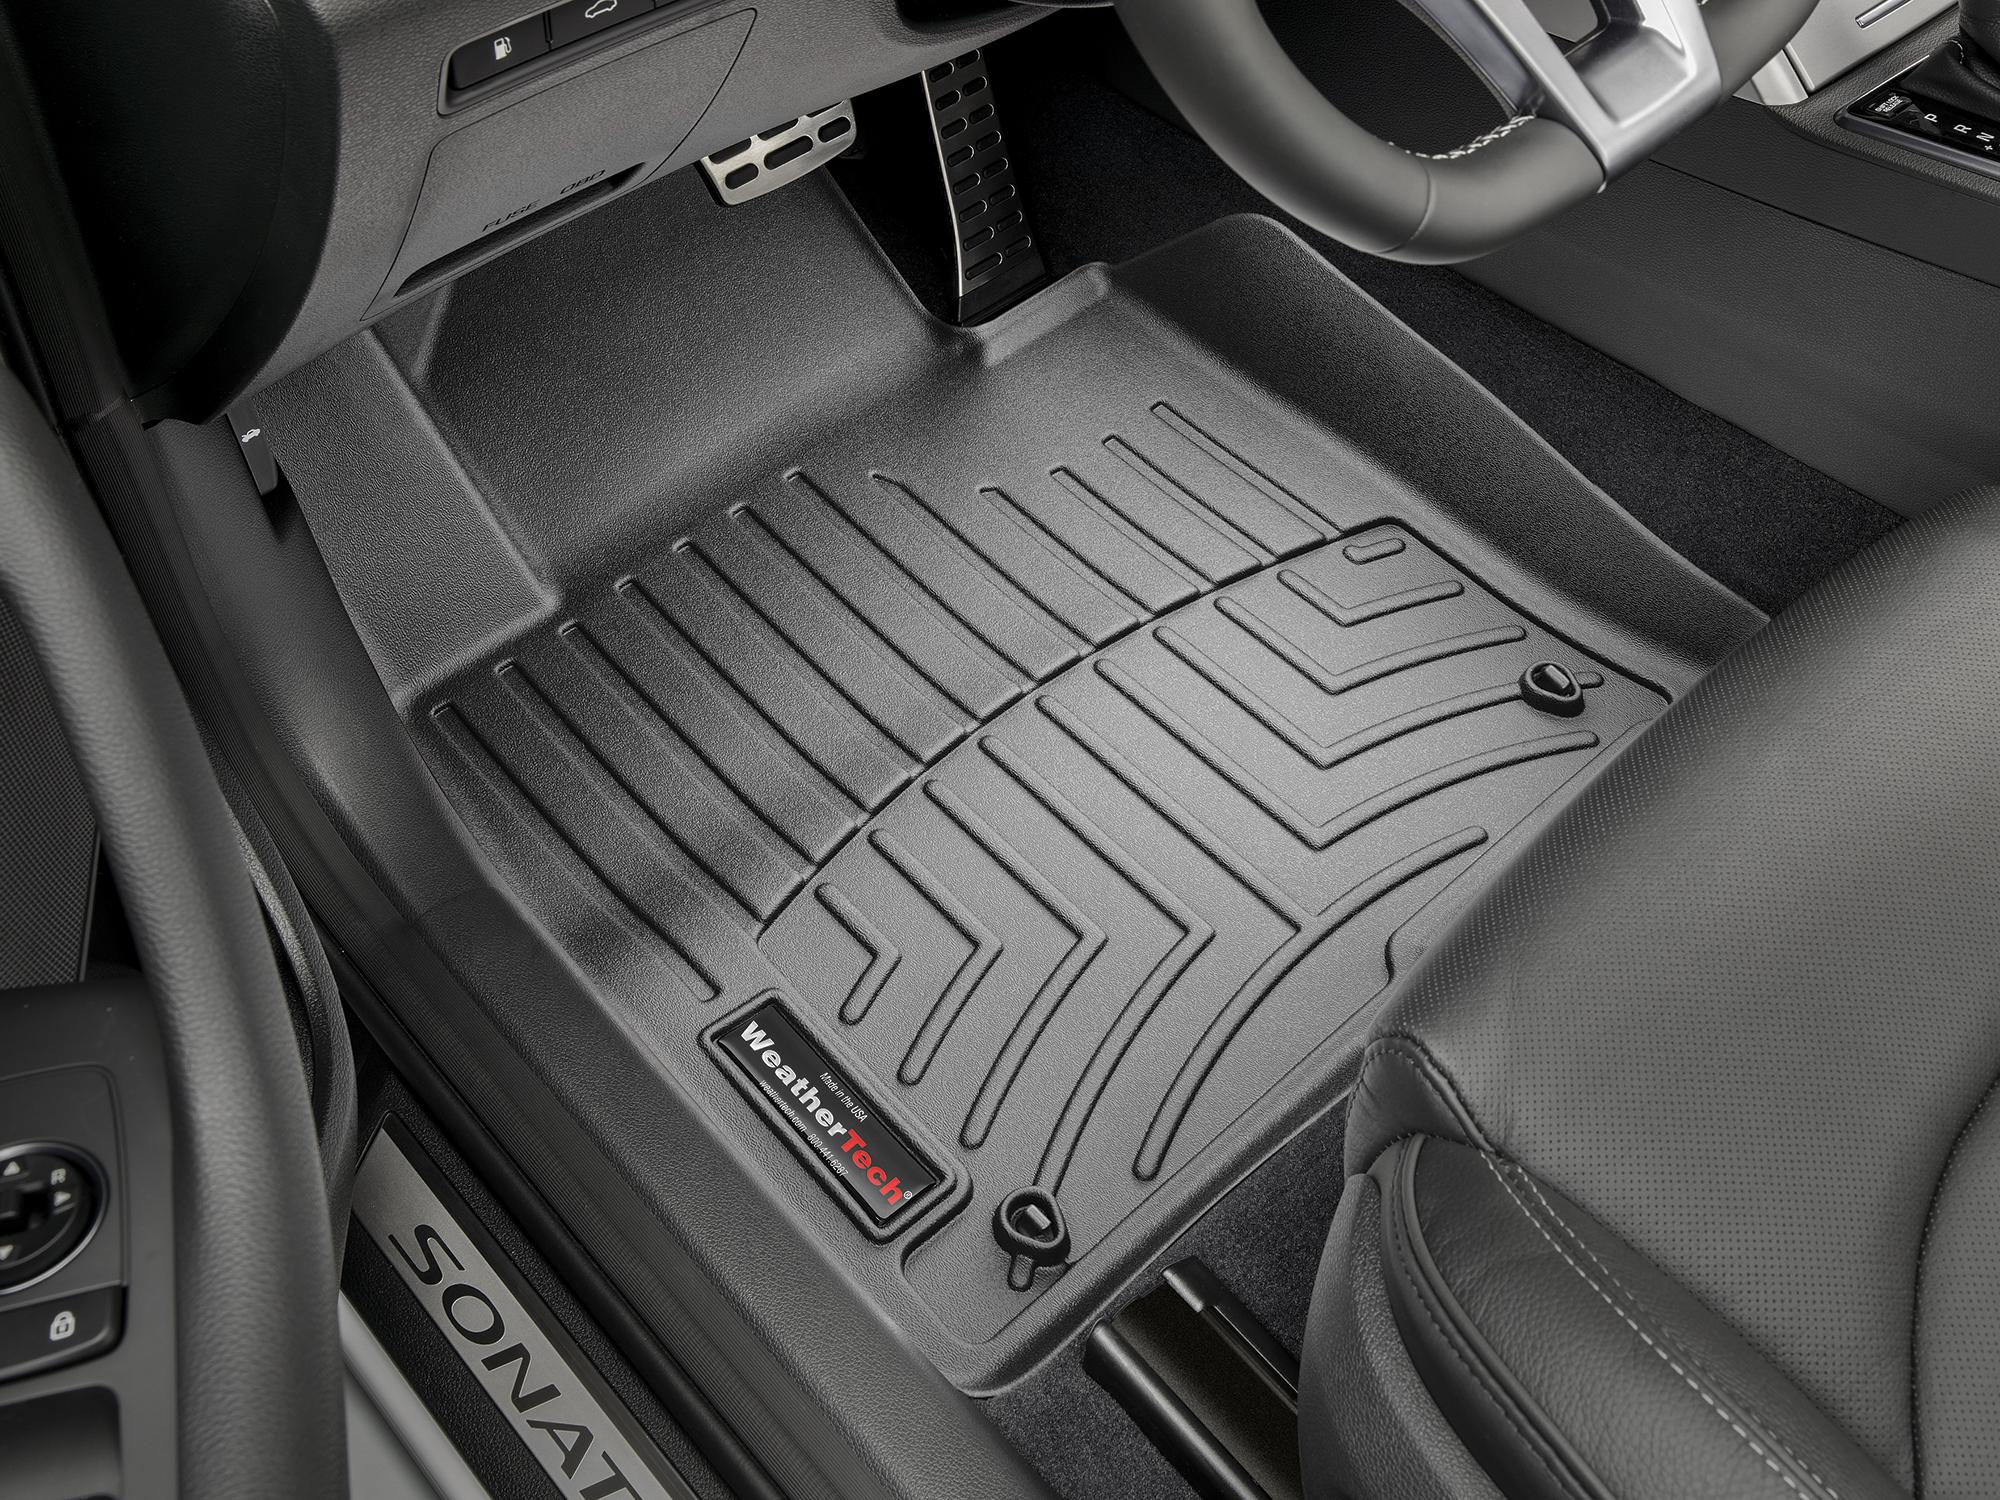 2018 Hyundai Sonata Avm Hd Floor Mats Heavy Duty Flexible Trim To Fit Weathertech